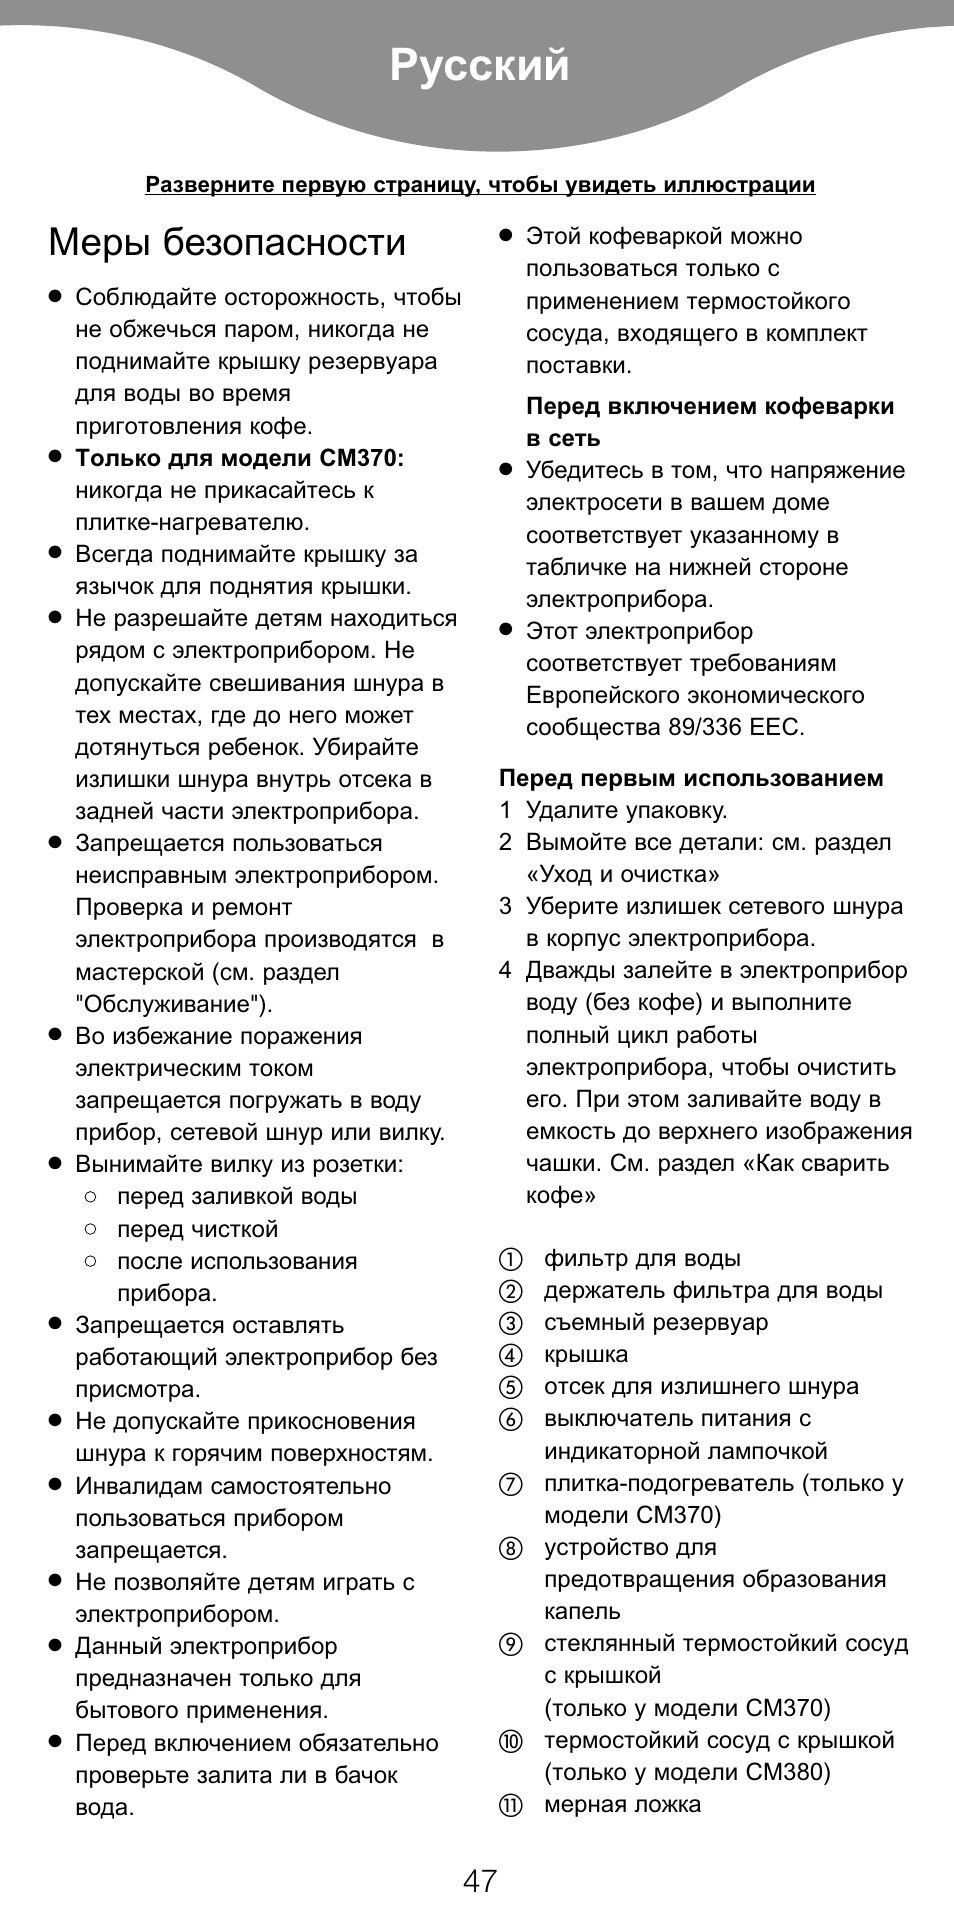 Русский 19ecce615a688